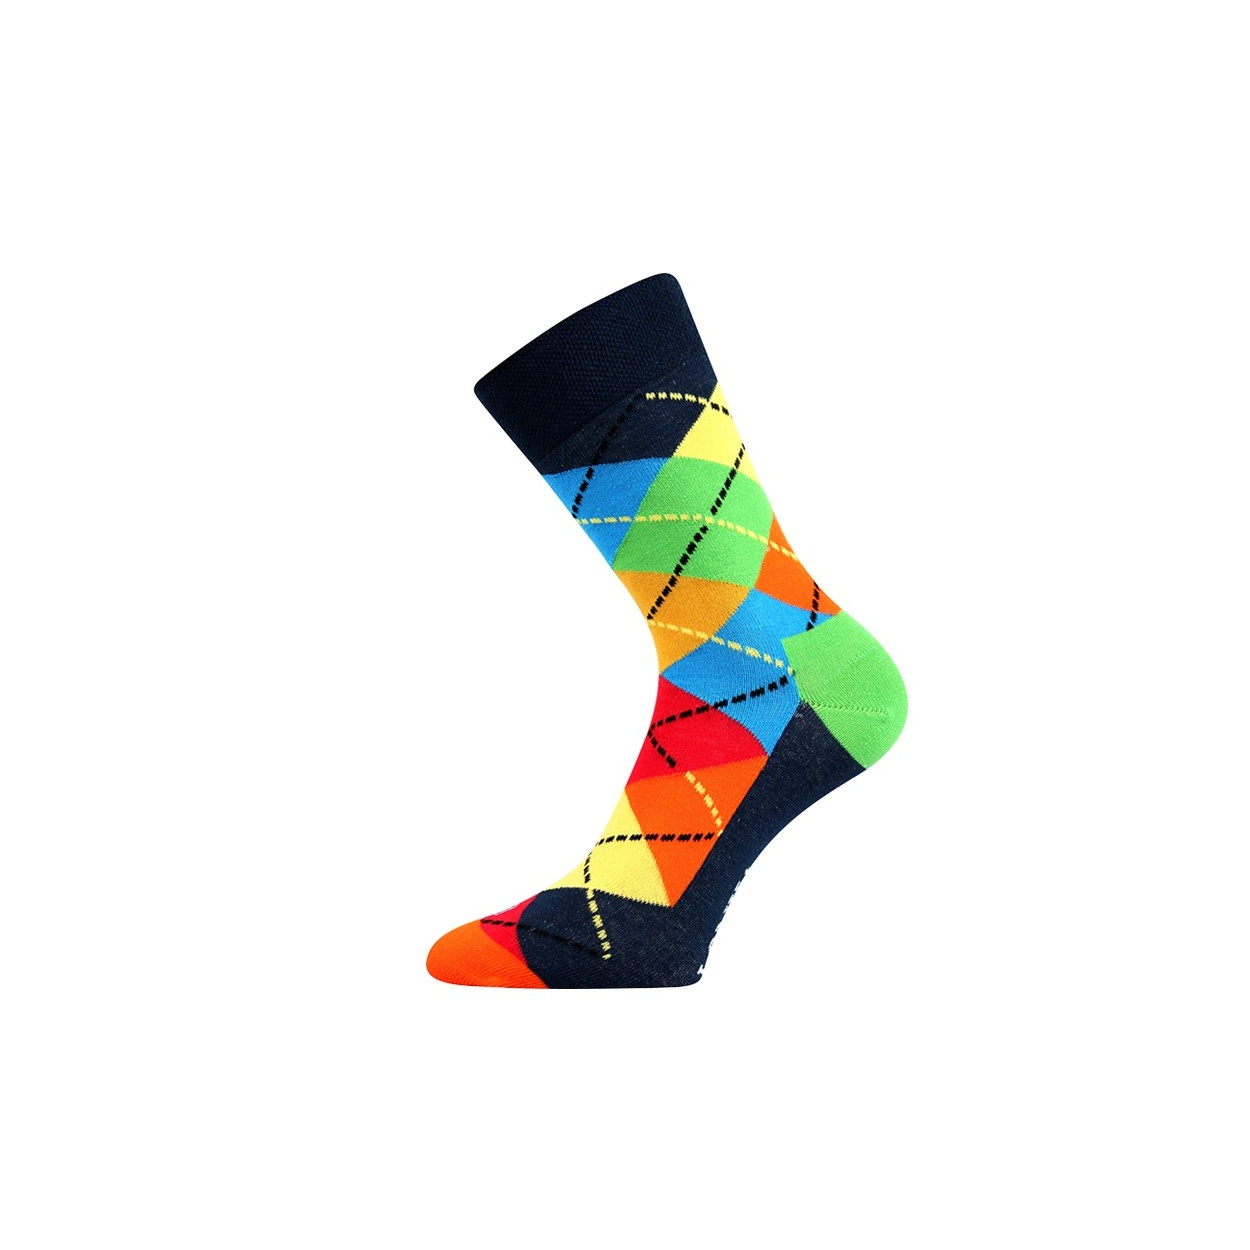 Modré pánské ponožky s kostkami WOODOO